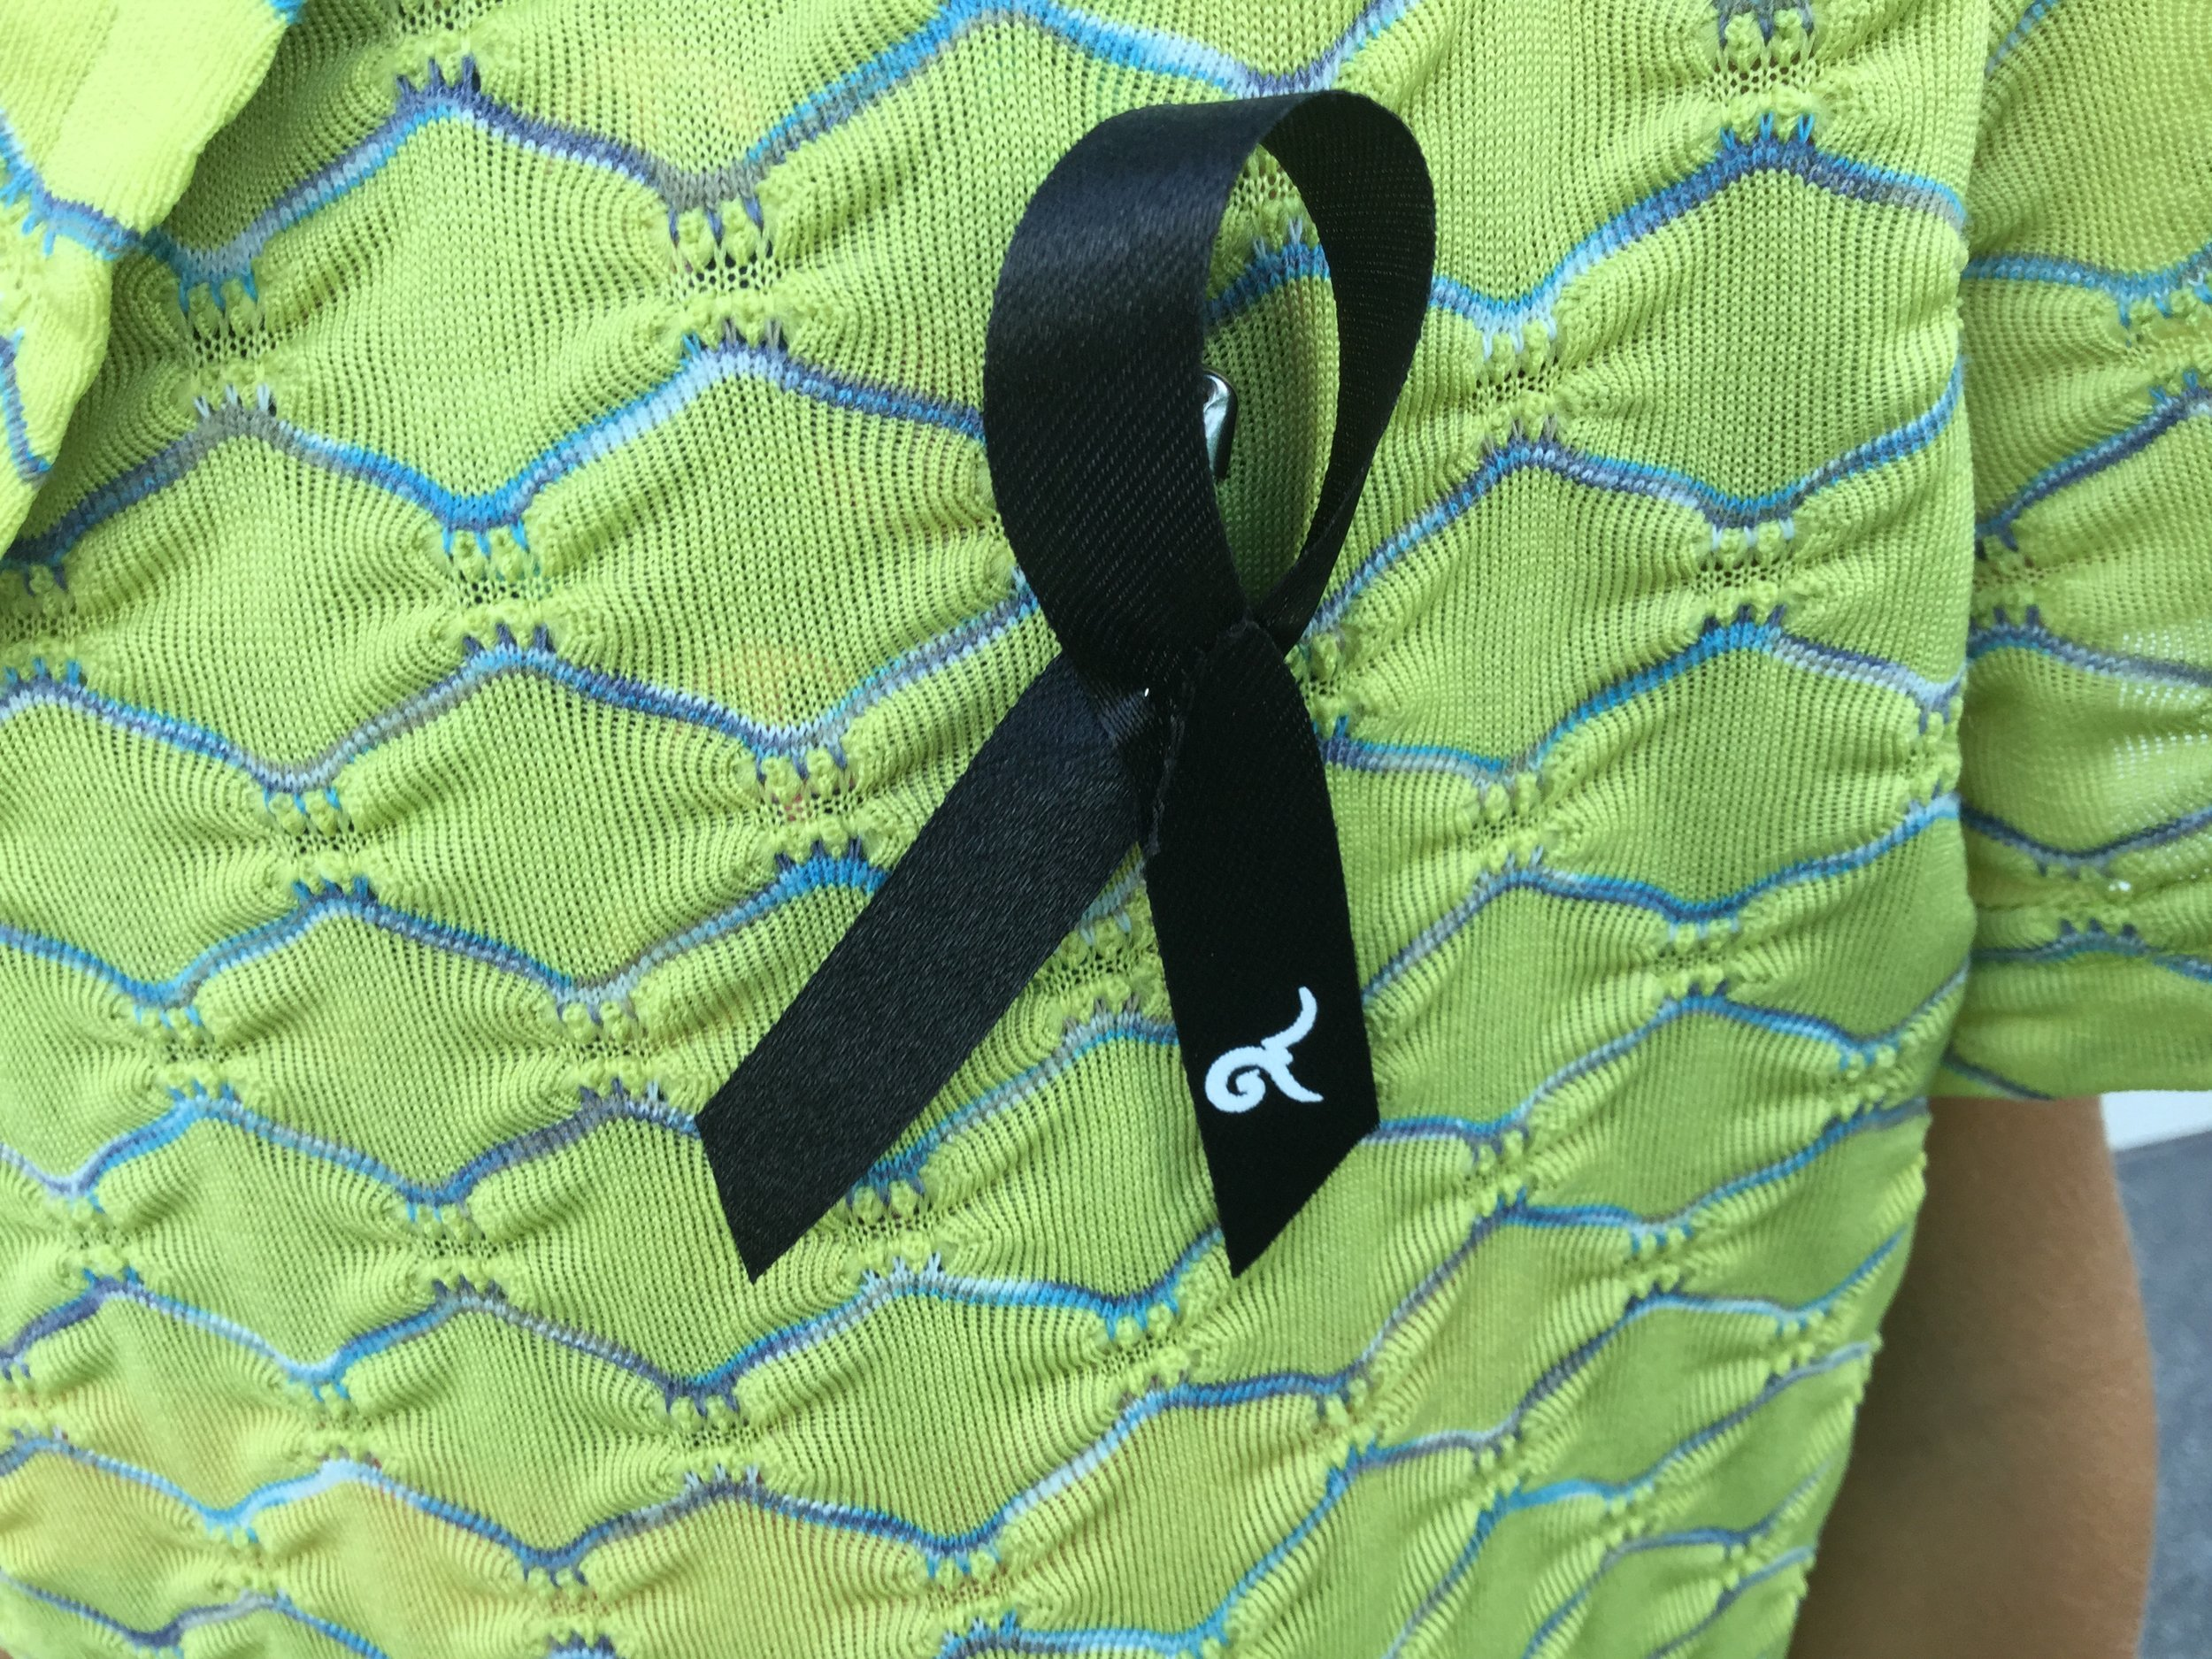 Lili wearing her lapel ribbon.